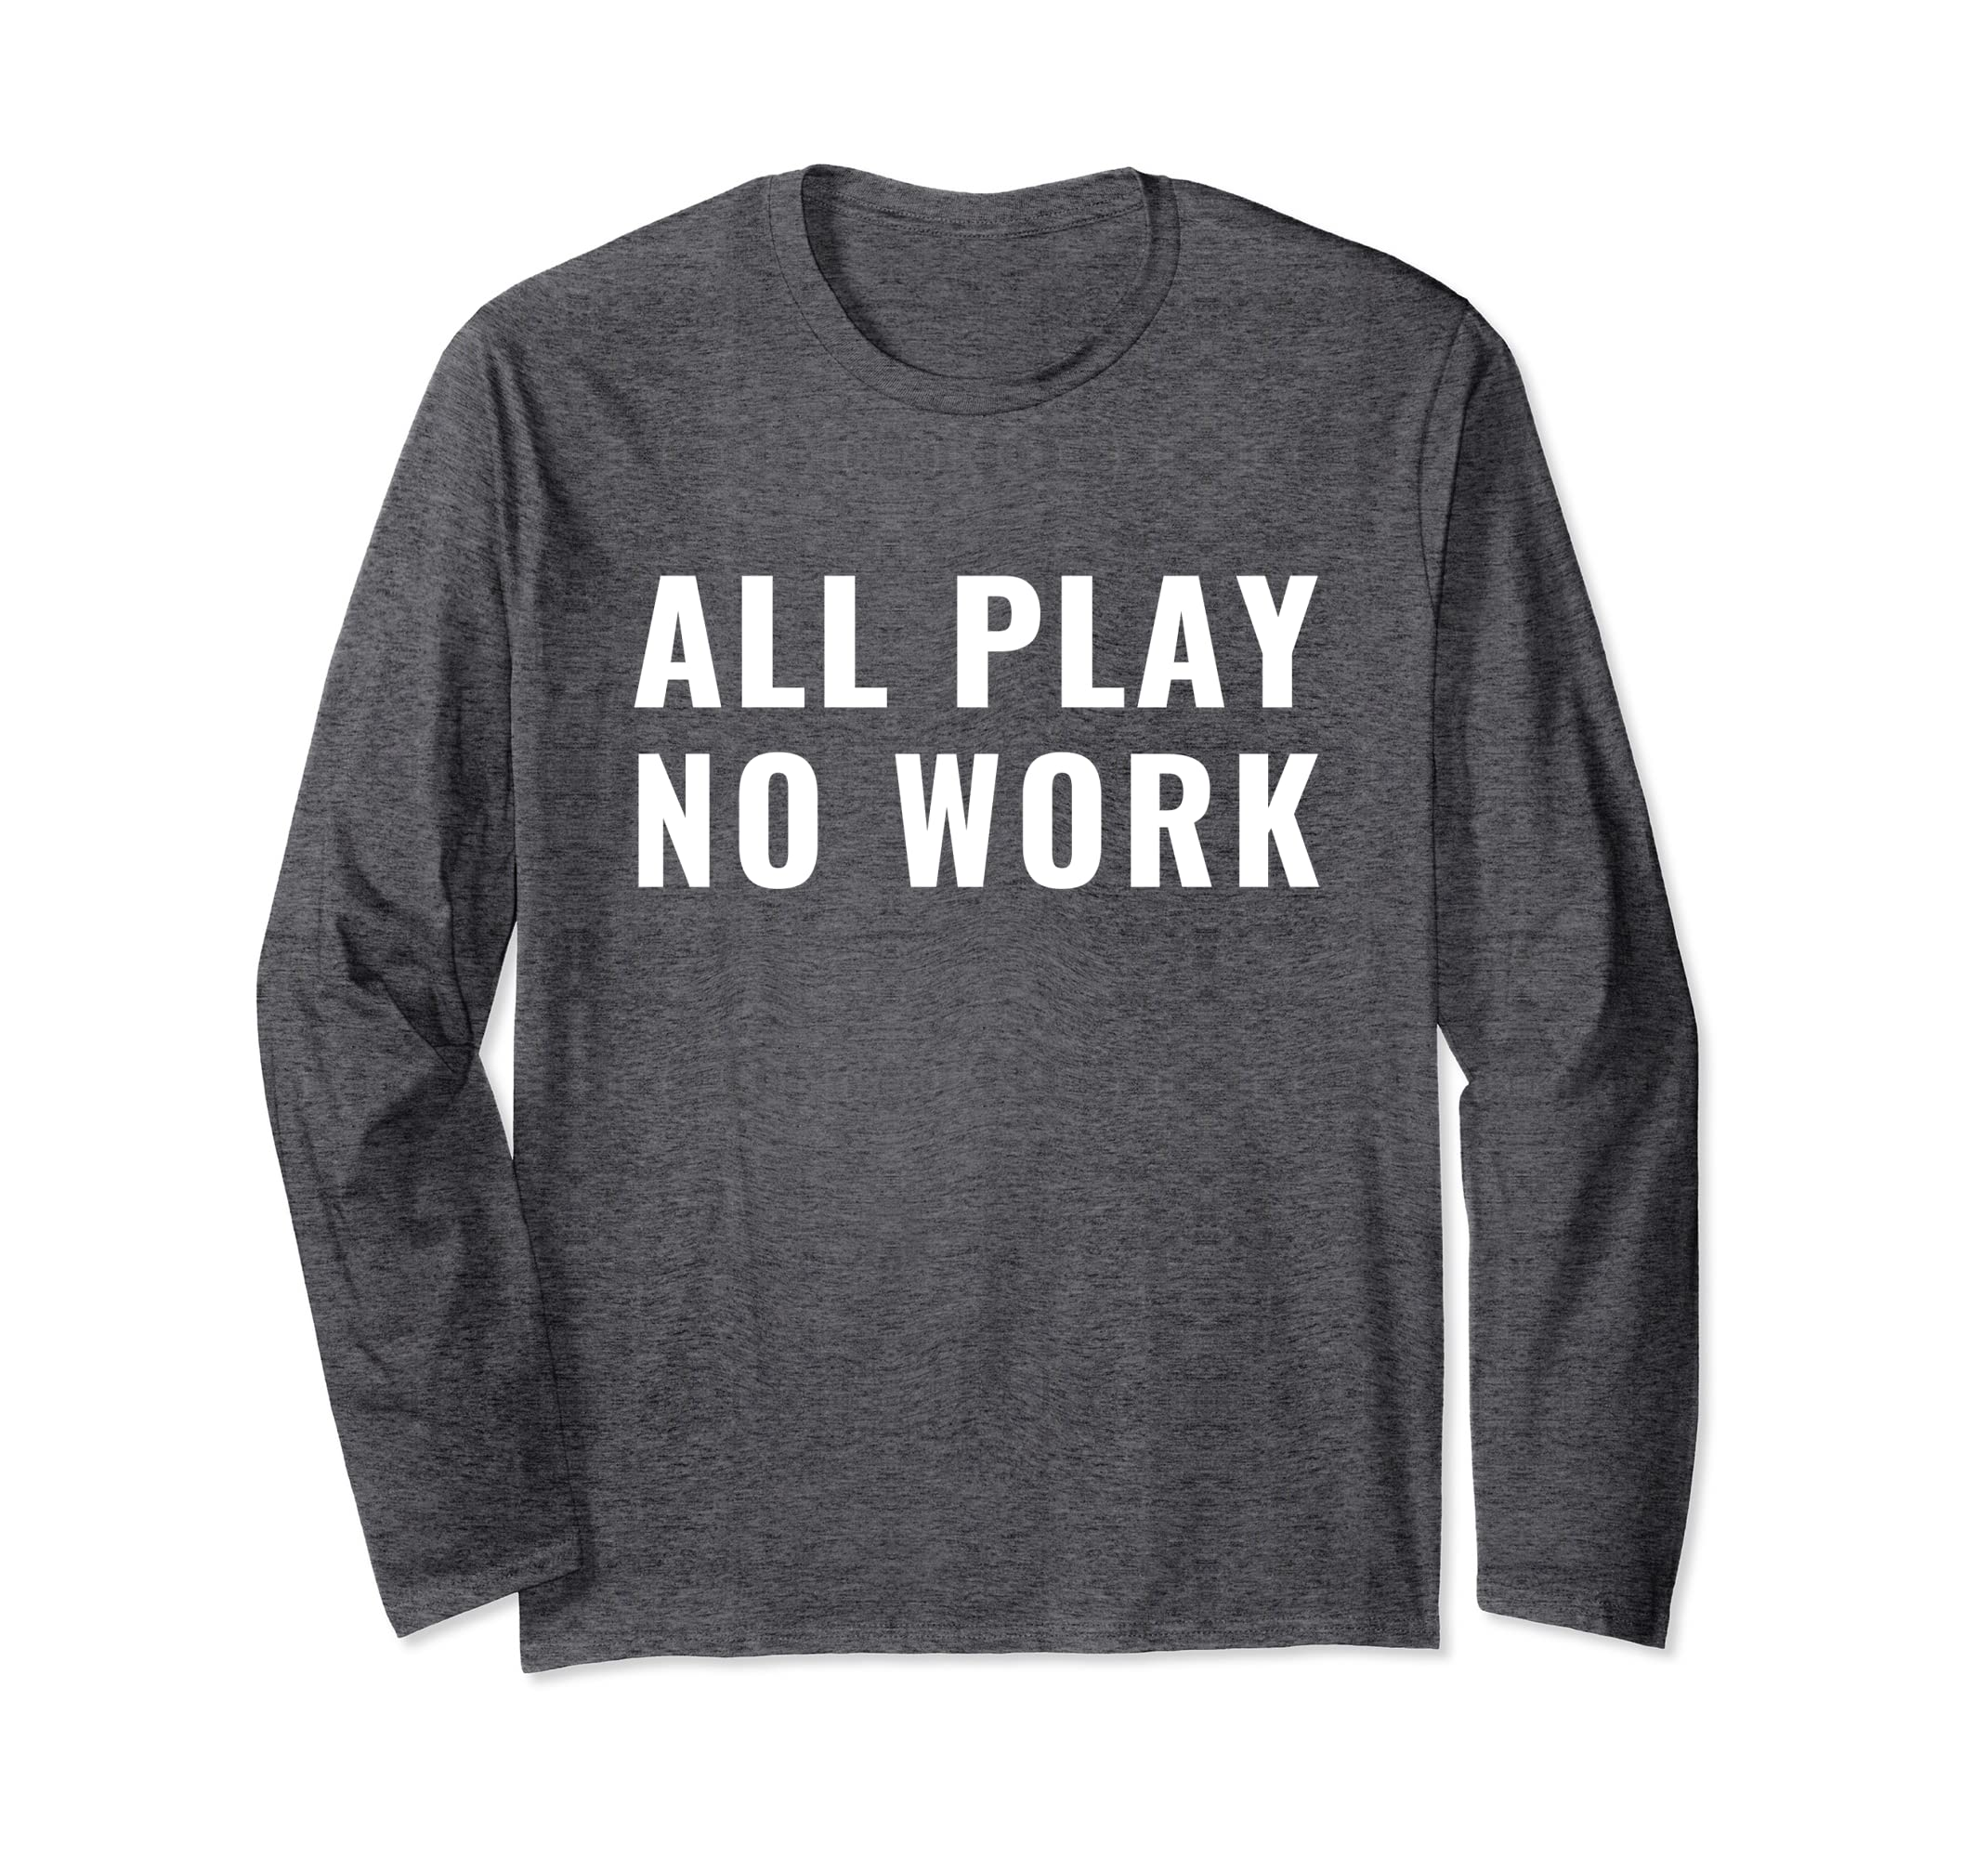 All Play No Work Funny Long Sleeve Shirt-Awarplus